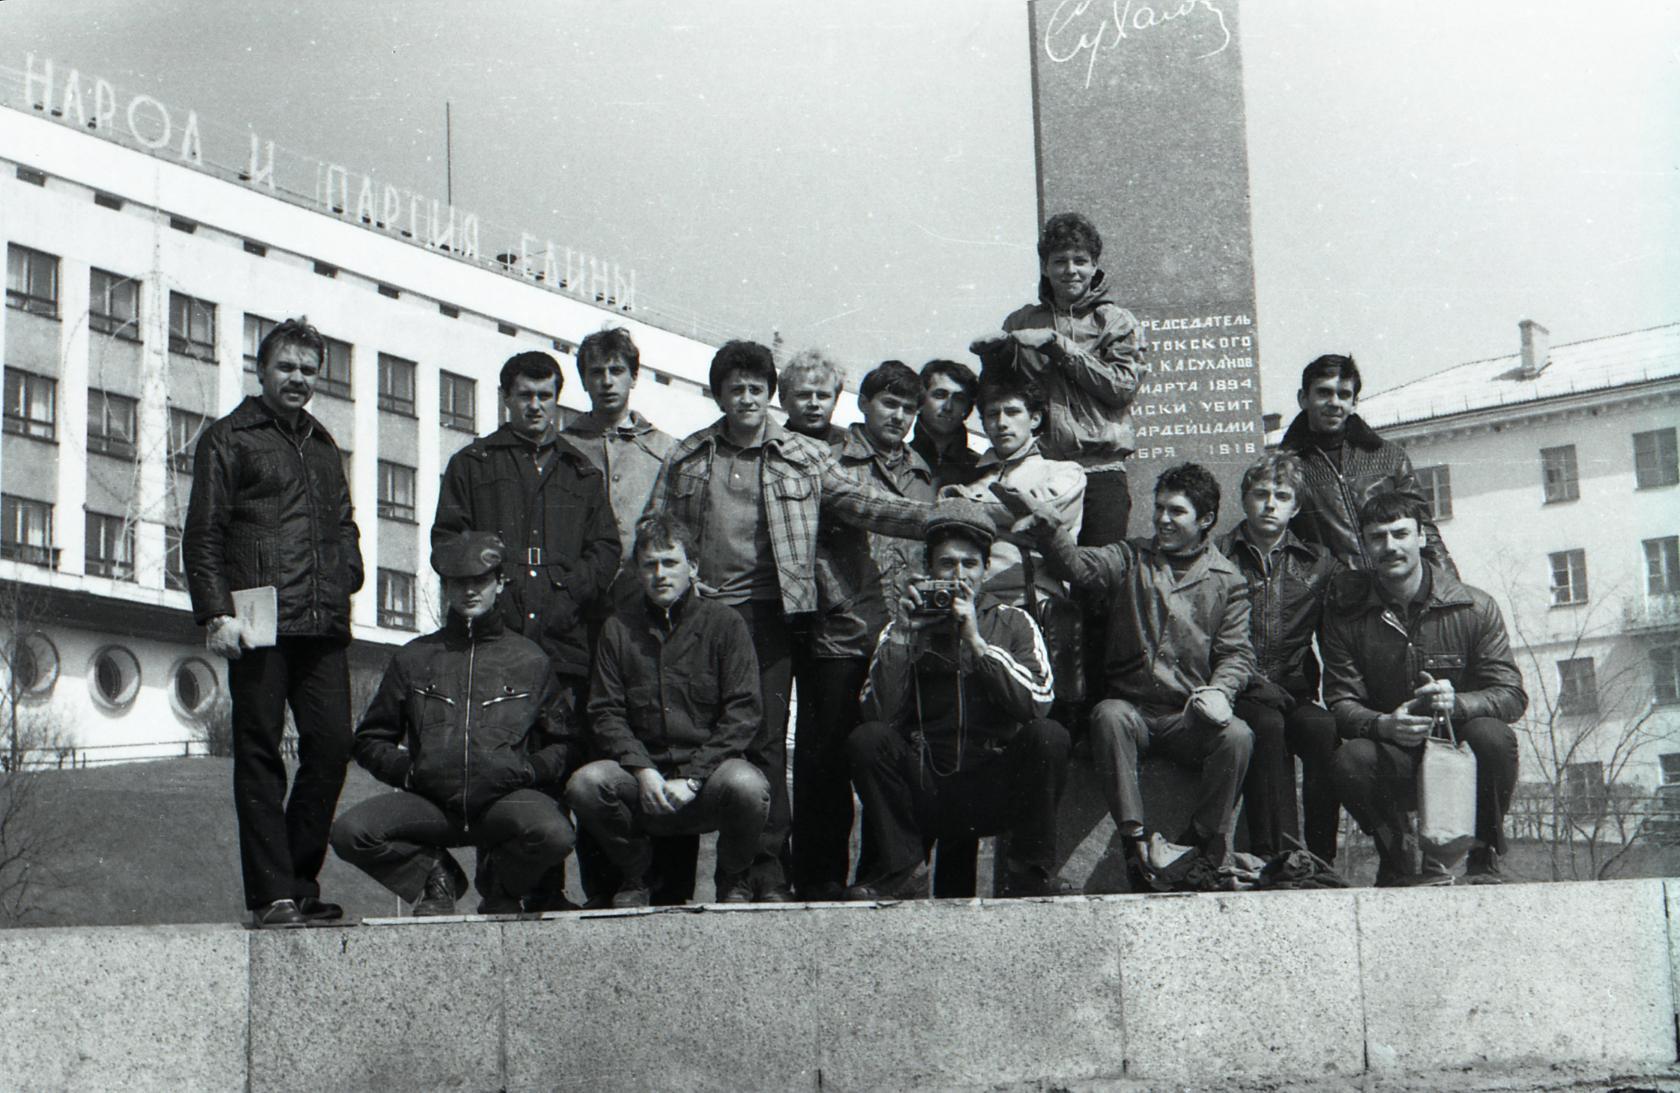 Секс с узбеками во владивостоке 6 фотография